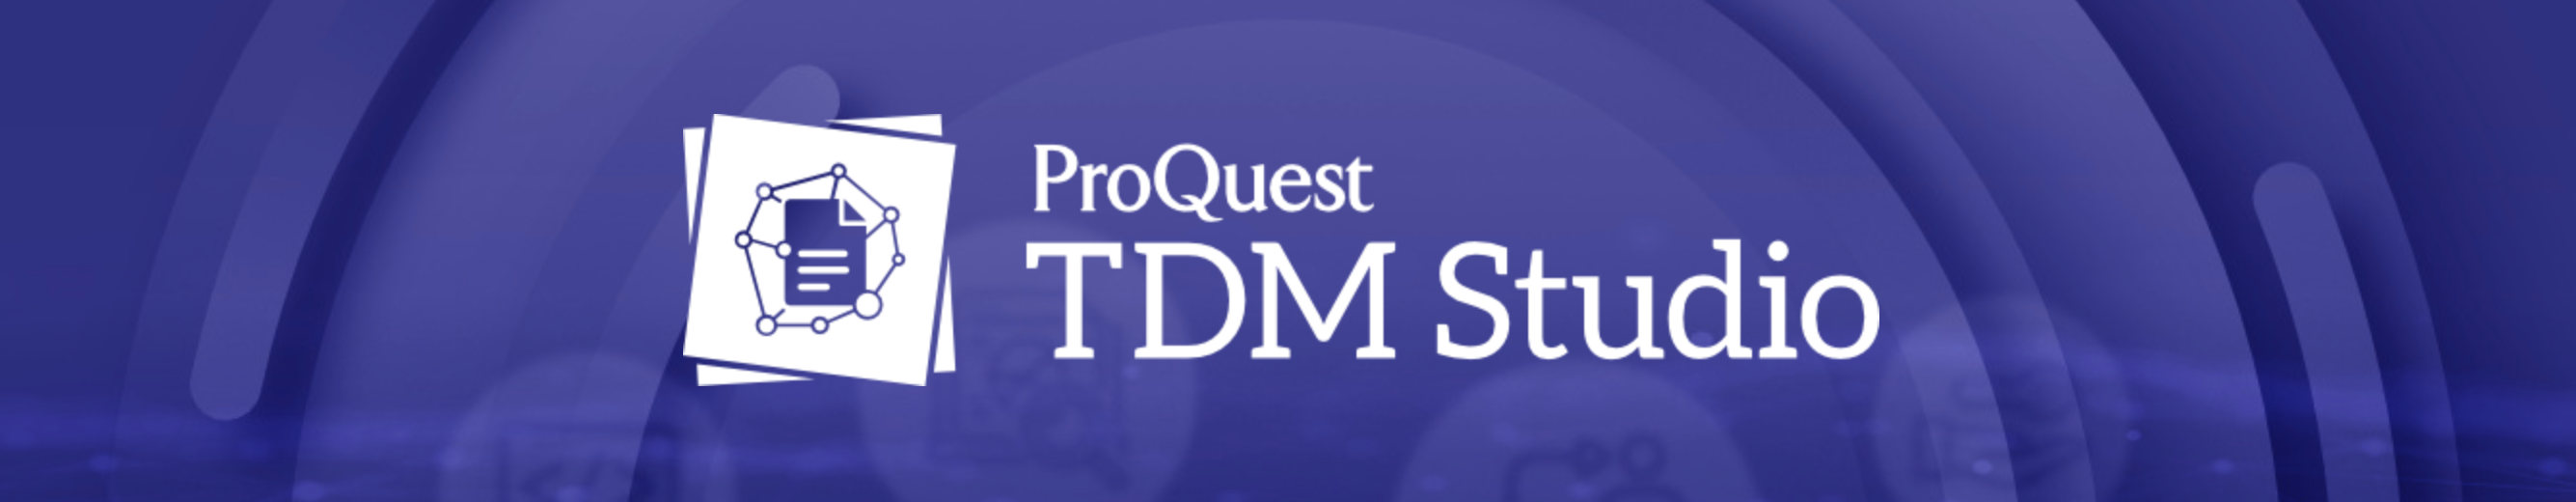 TMD Studio Banner